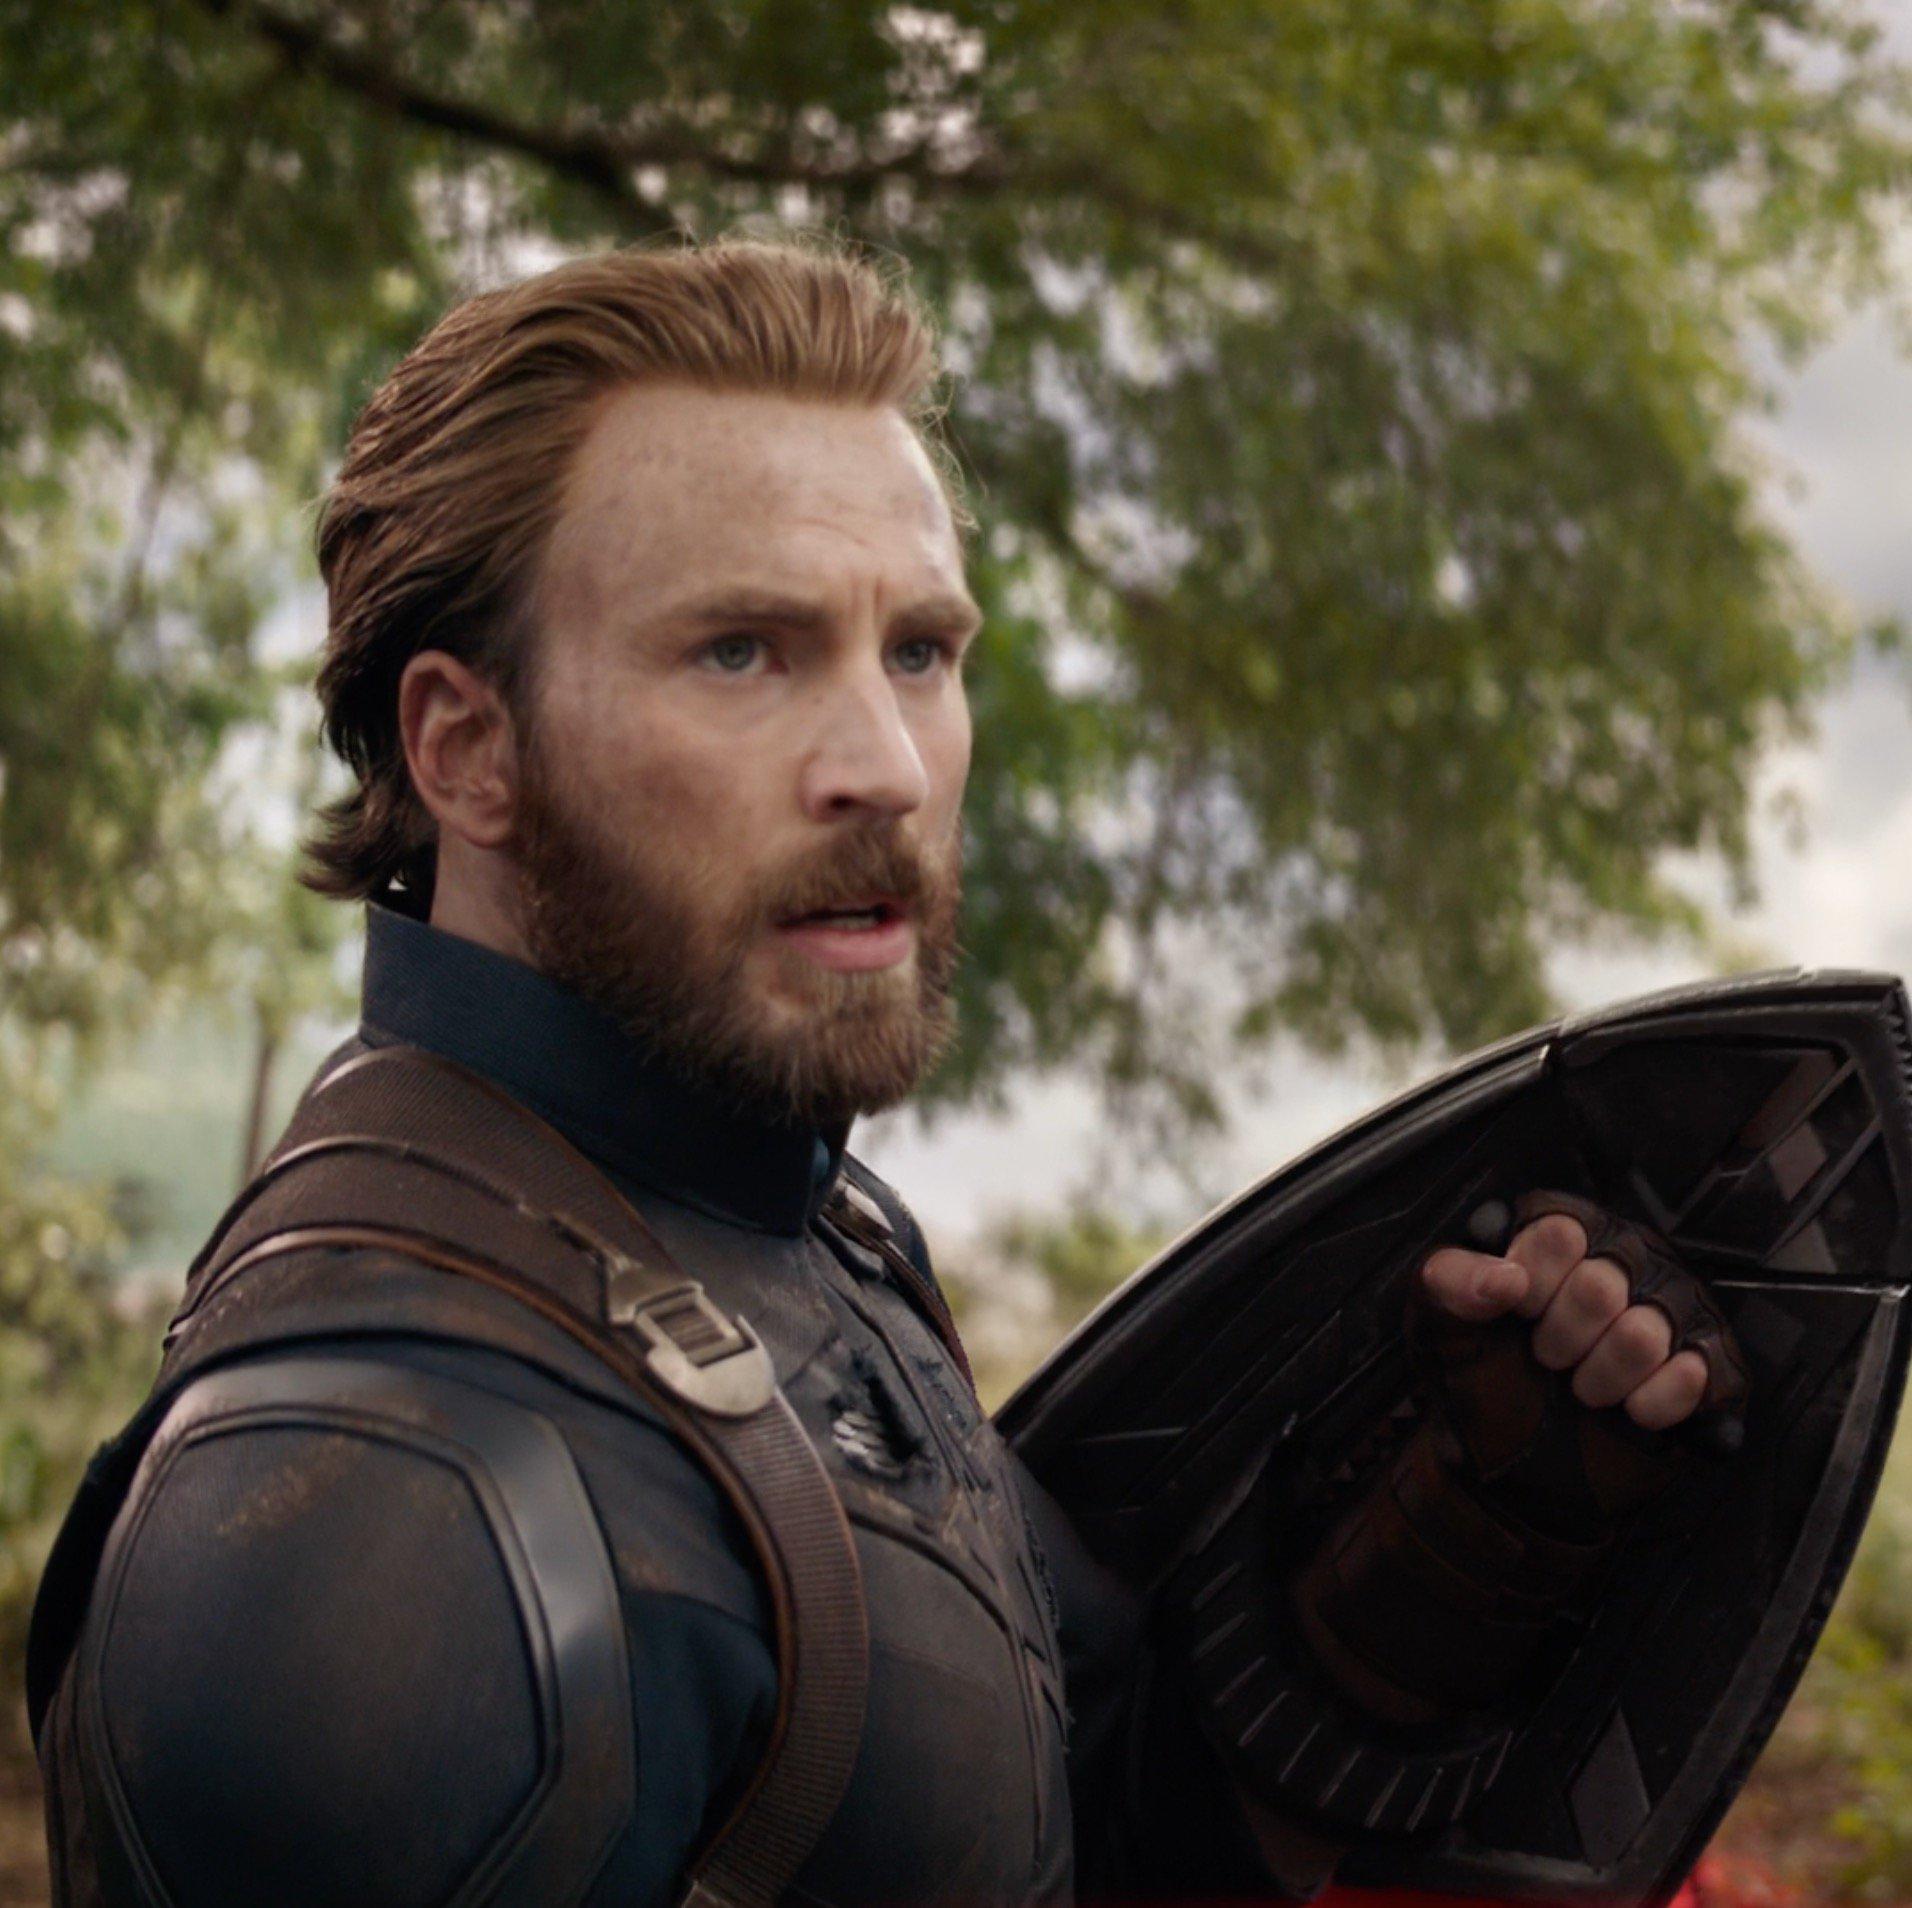 """The end is near."" One month until @Avengers: #InfinityWar. Get tickets now: https://t.co/xQsJem15EU https://t.co/vbX0JX5OwX"